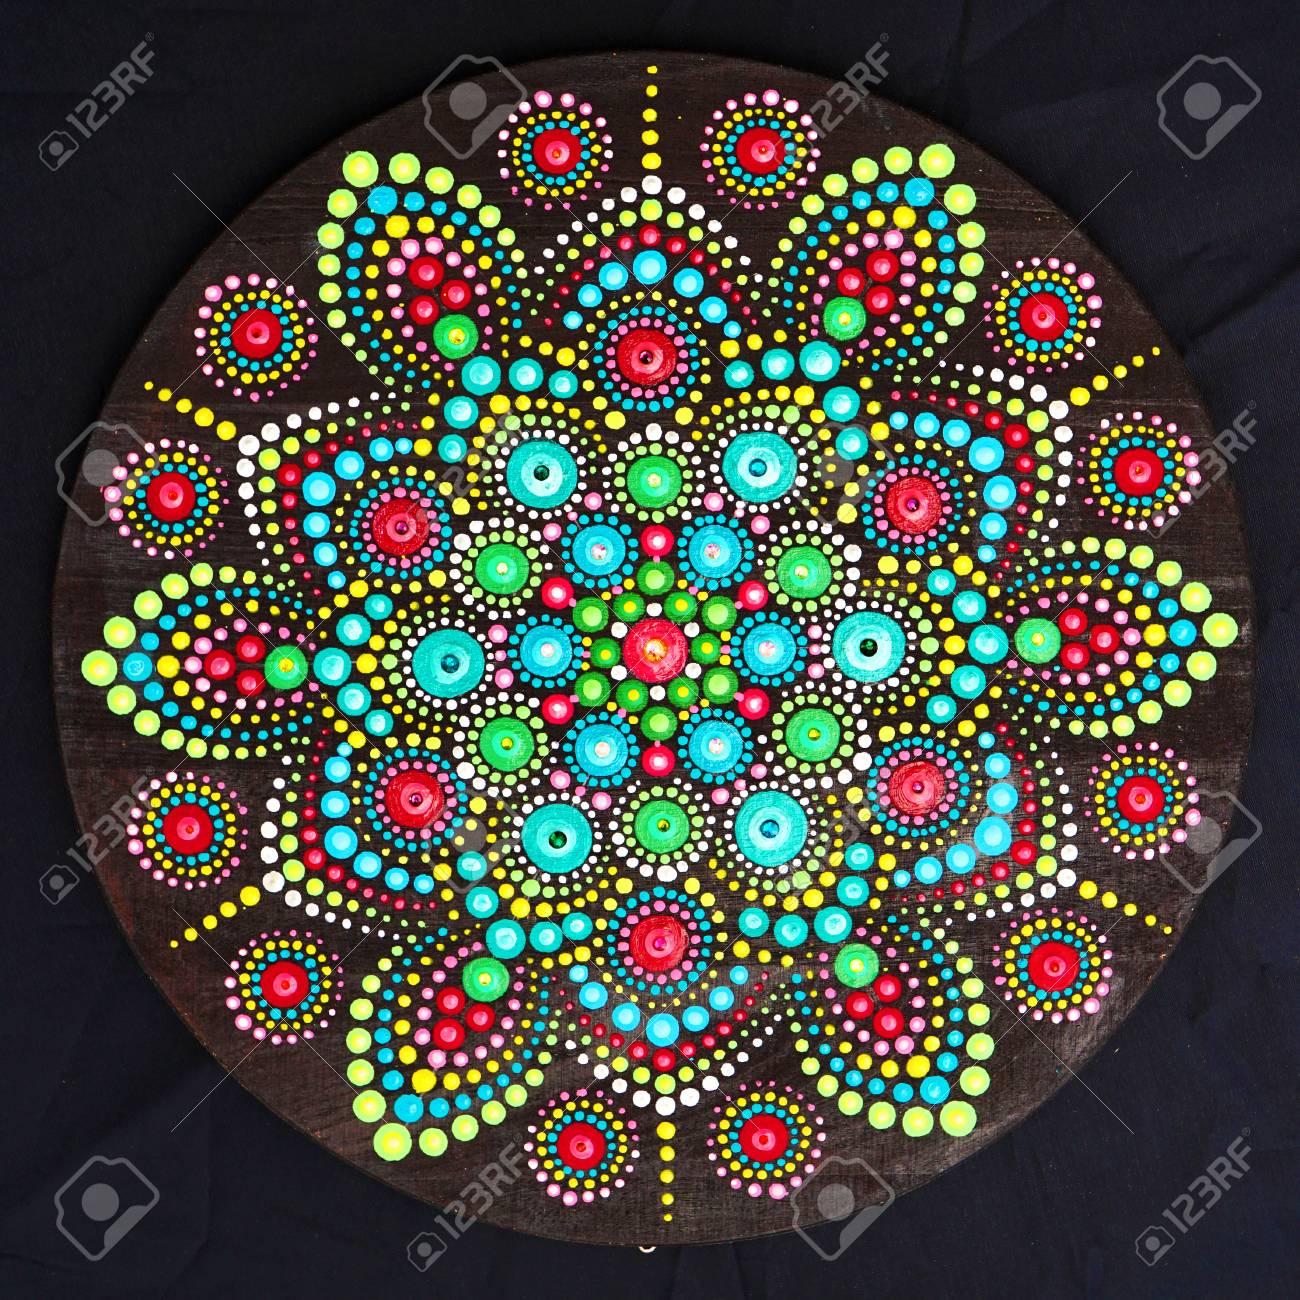 a612e7e1d1db5 Beautiful mandala hand painted by dots